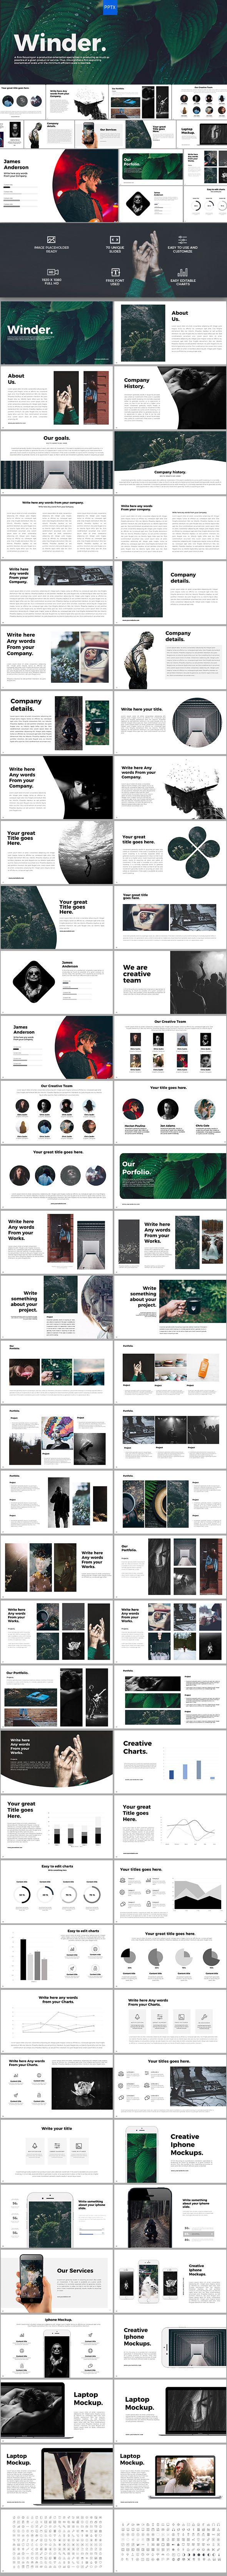 Winder Powerpoint Template 70 Unique Custom Slides #design